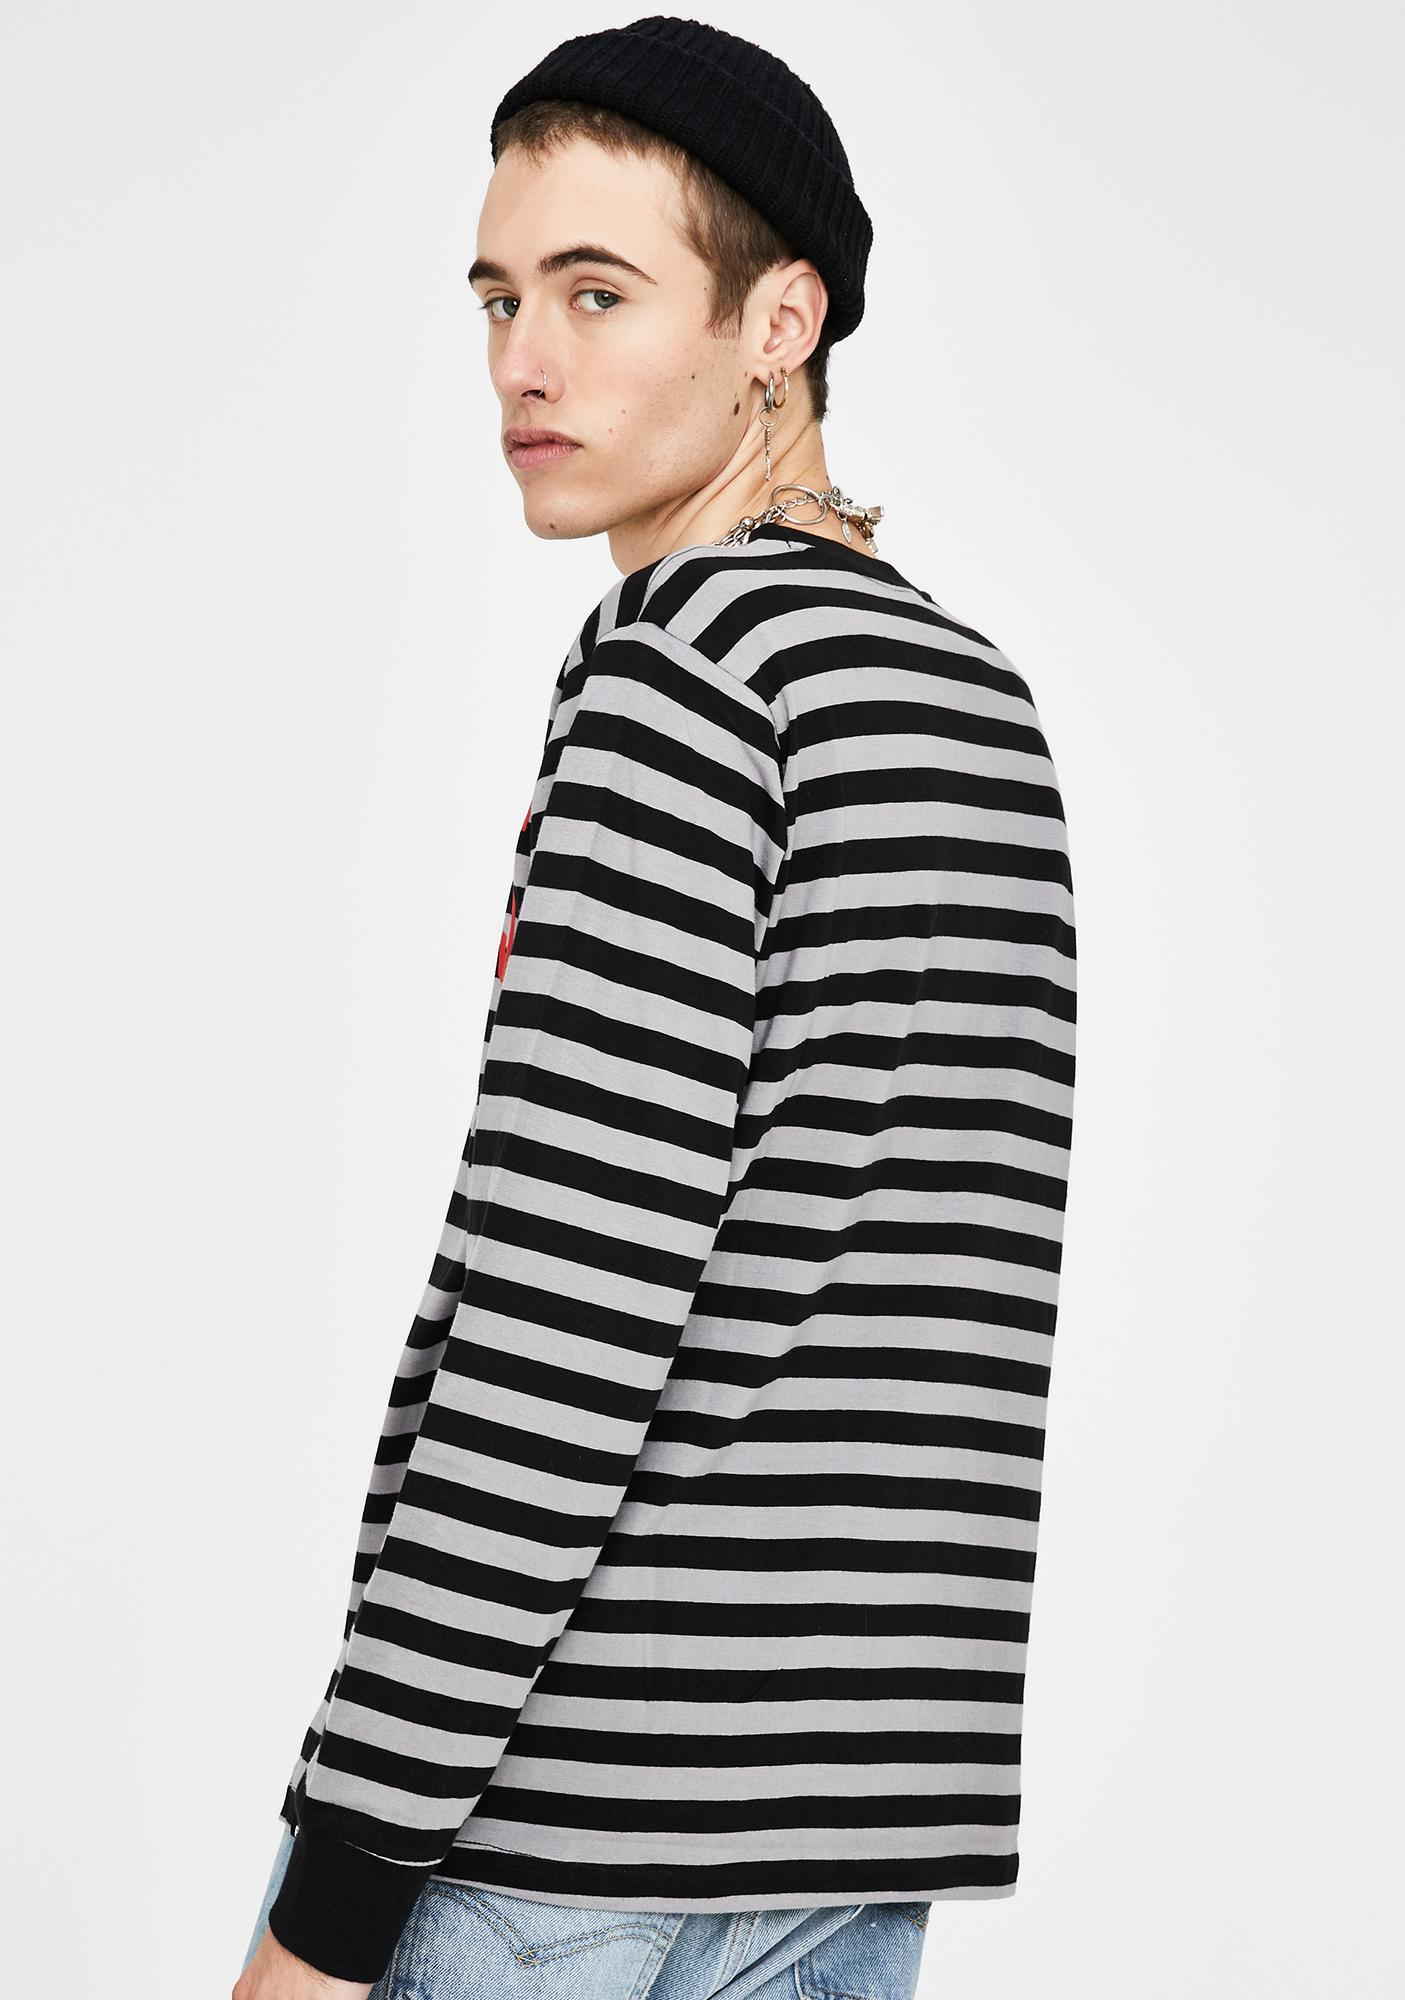 BROKEN PROMISES CO Untamed Striped Long Sleeve Tee